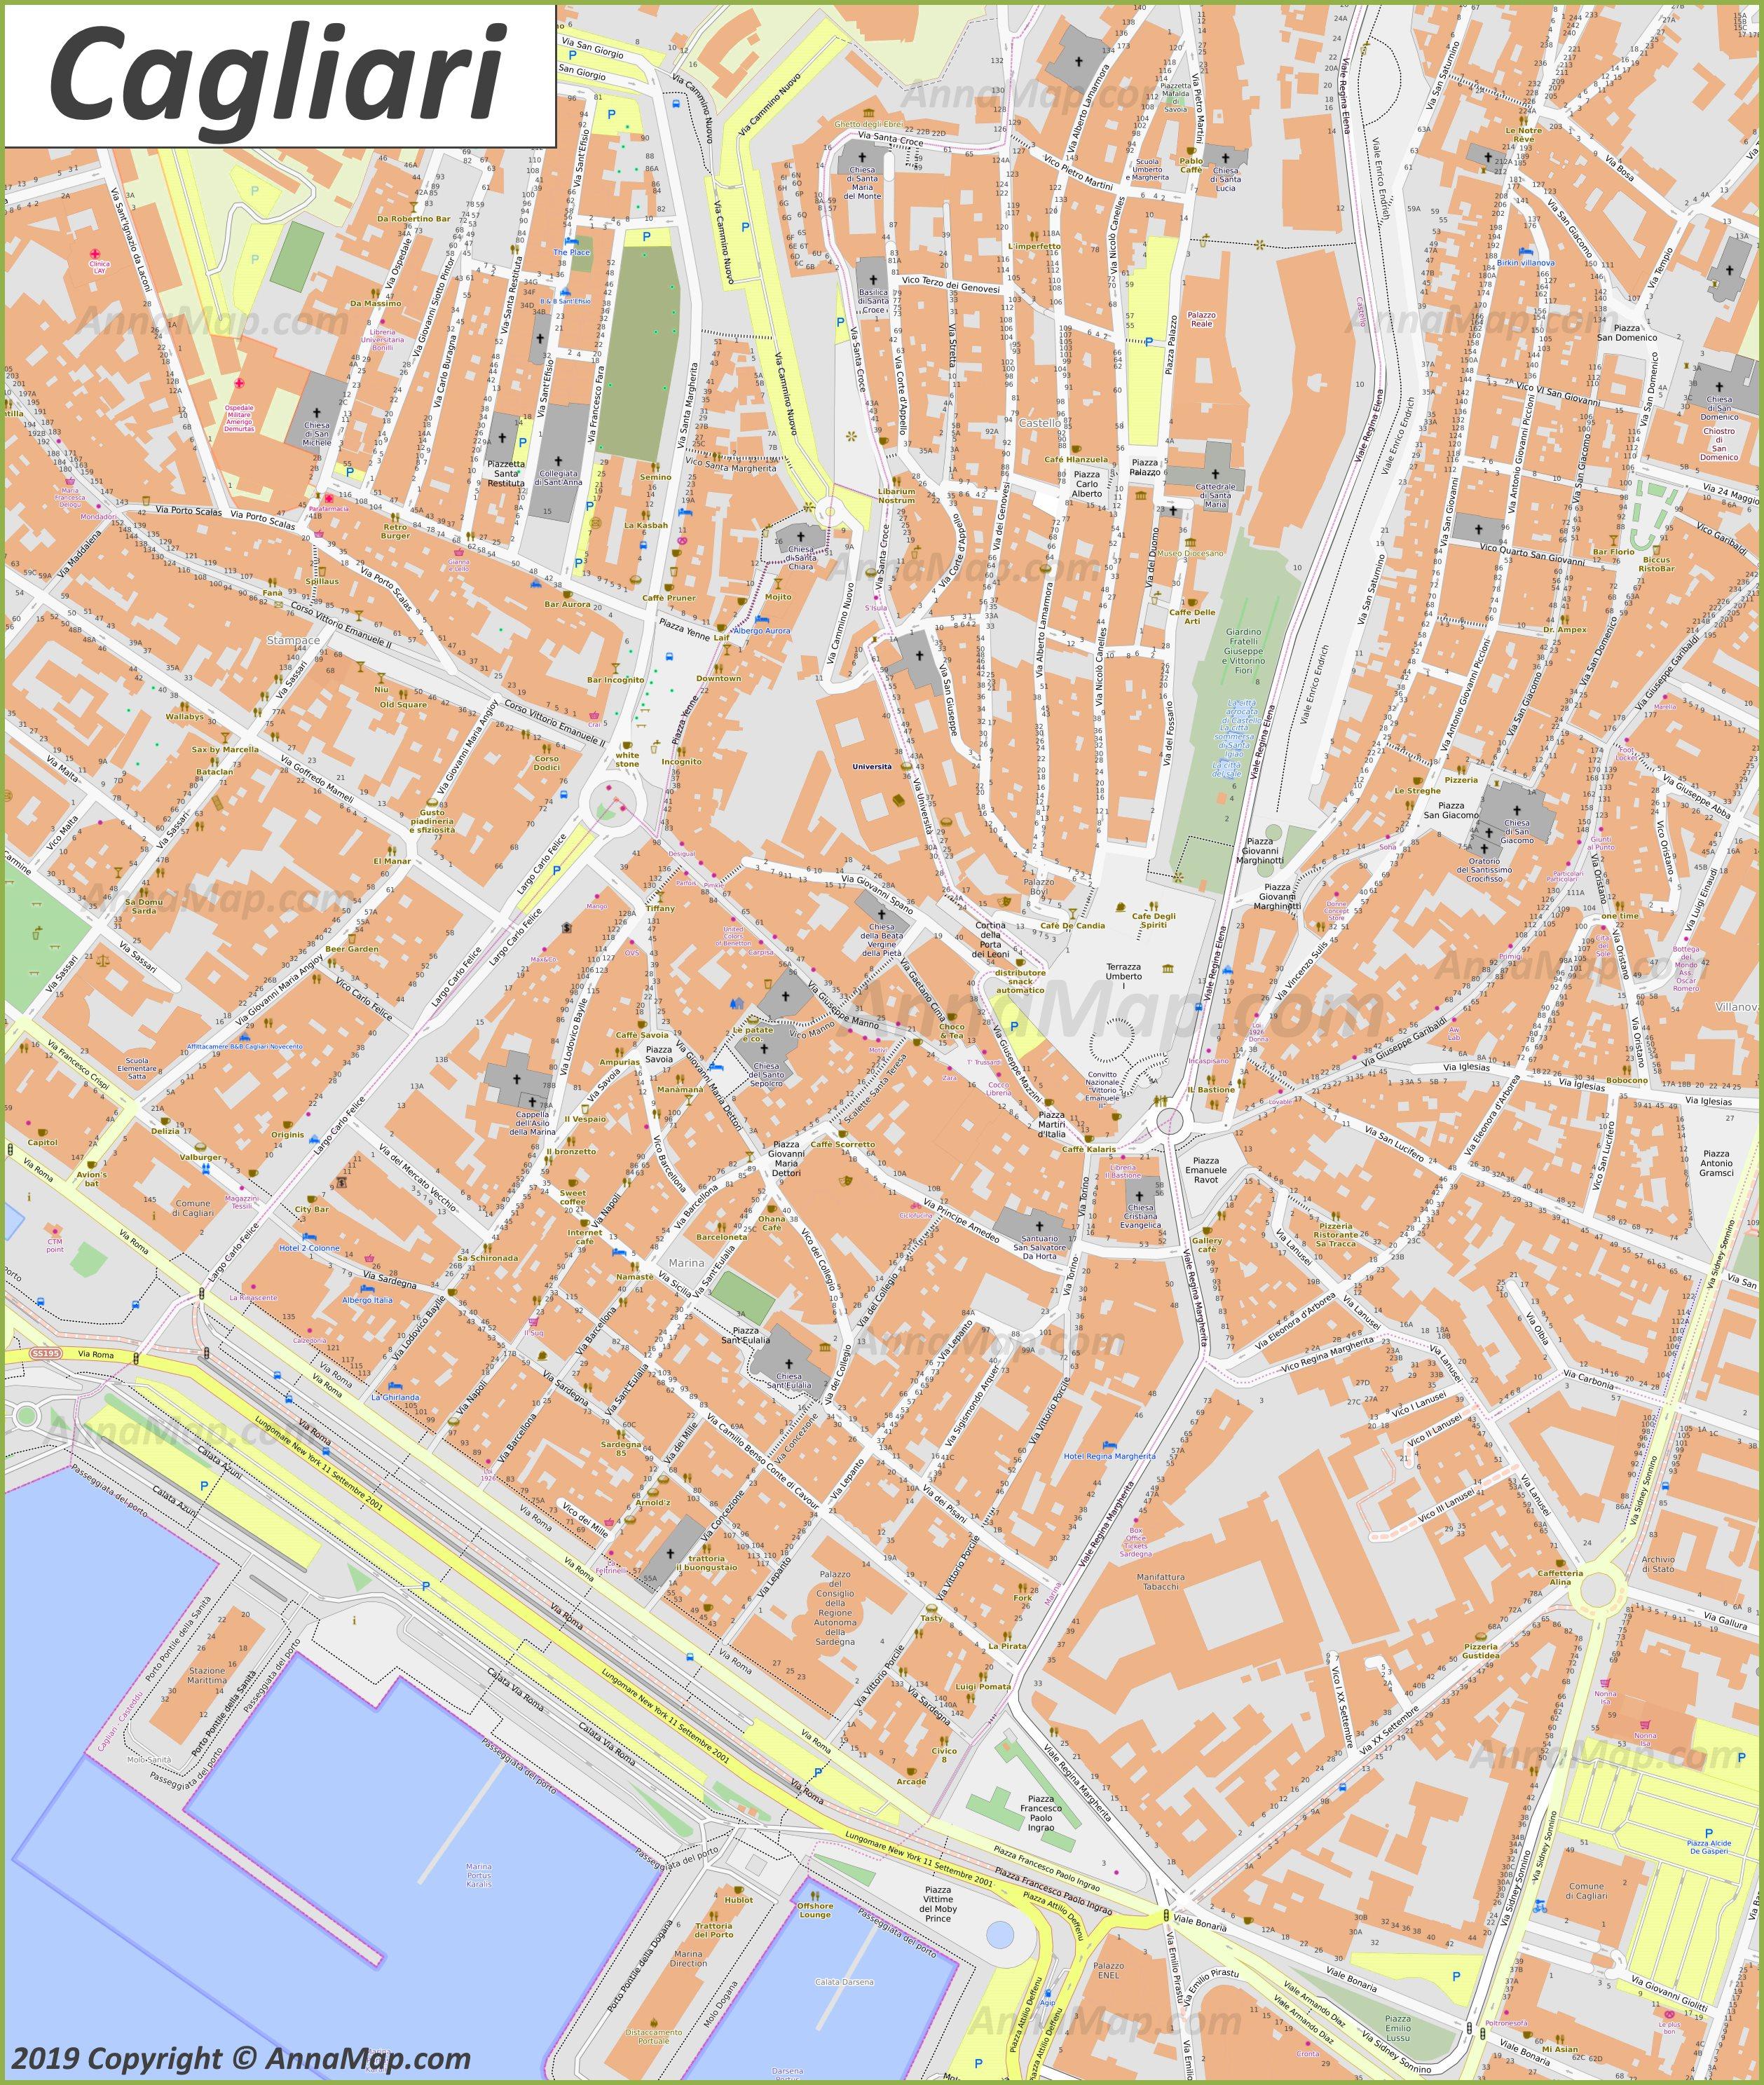 Detailed tourist maps of Cagliari | Italy | Free printable ...